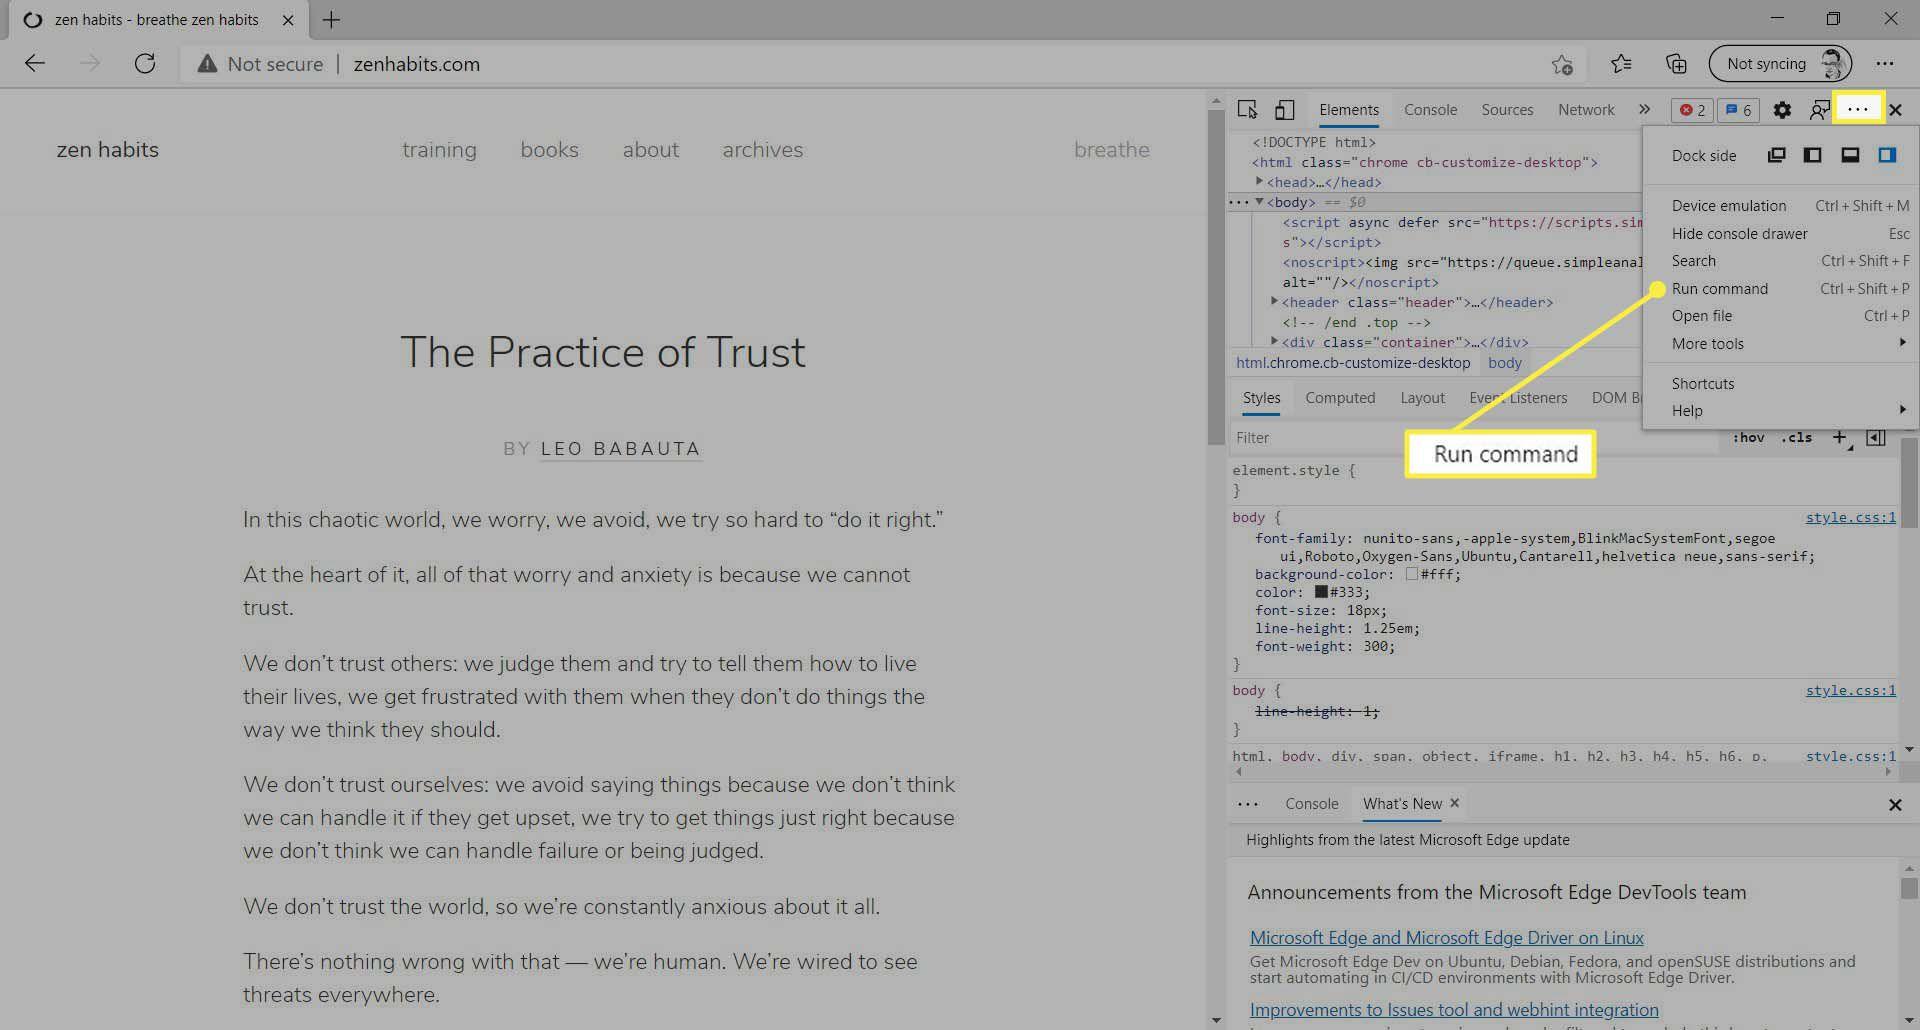 The Run command under the Open Customize and control DevTools menu in Microsoft Edge.